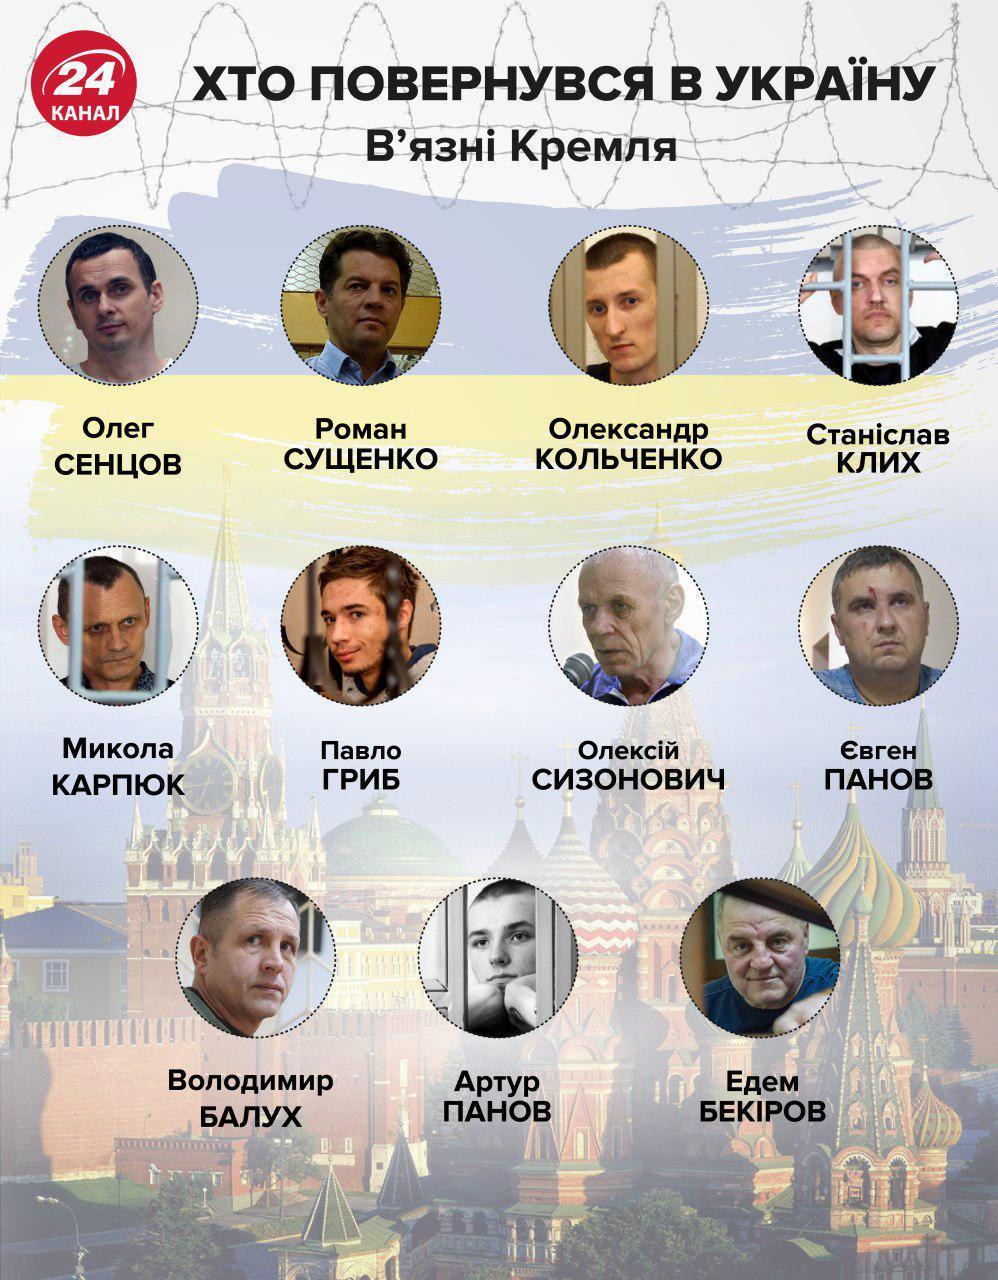 Українські політв'язні / фото 24 канал